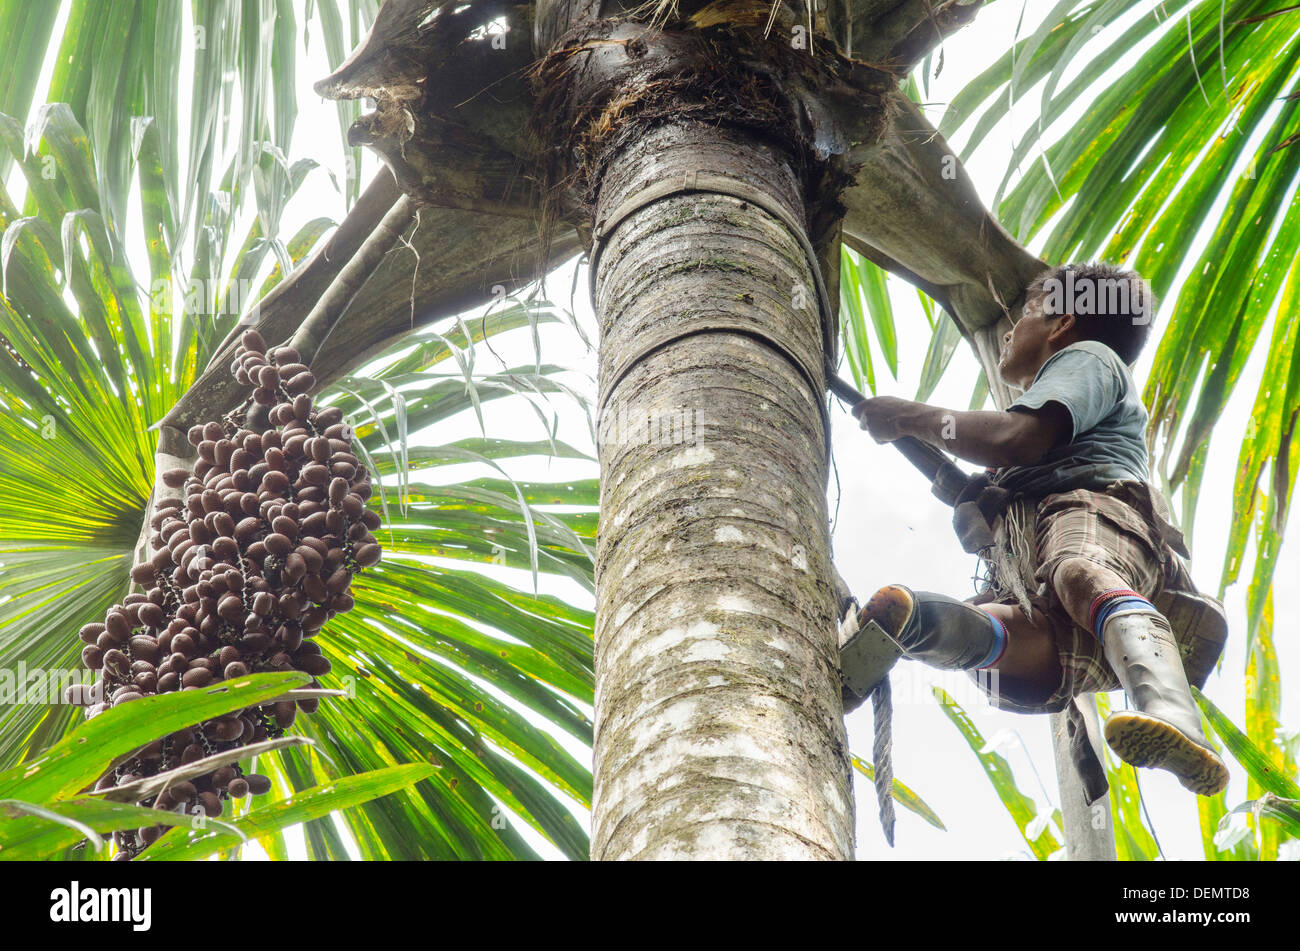 Sustainable palm harvesting by climbing Aguaje or Buiti Mauritia flexuosa, Rio Napo, Amazonia, Peru - Stock Image